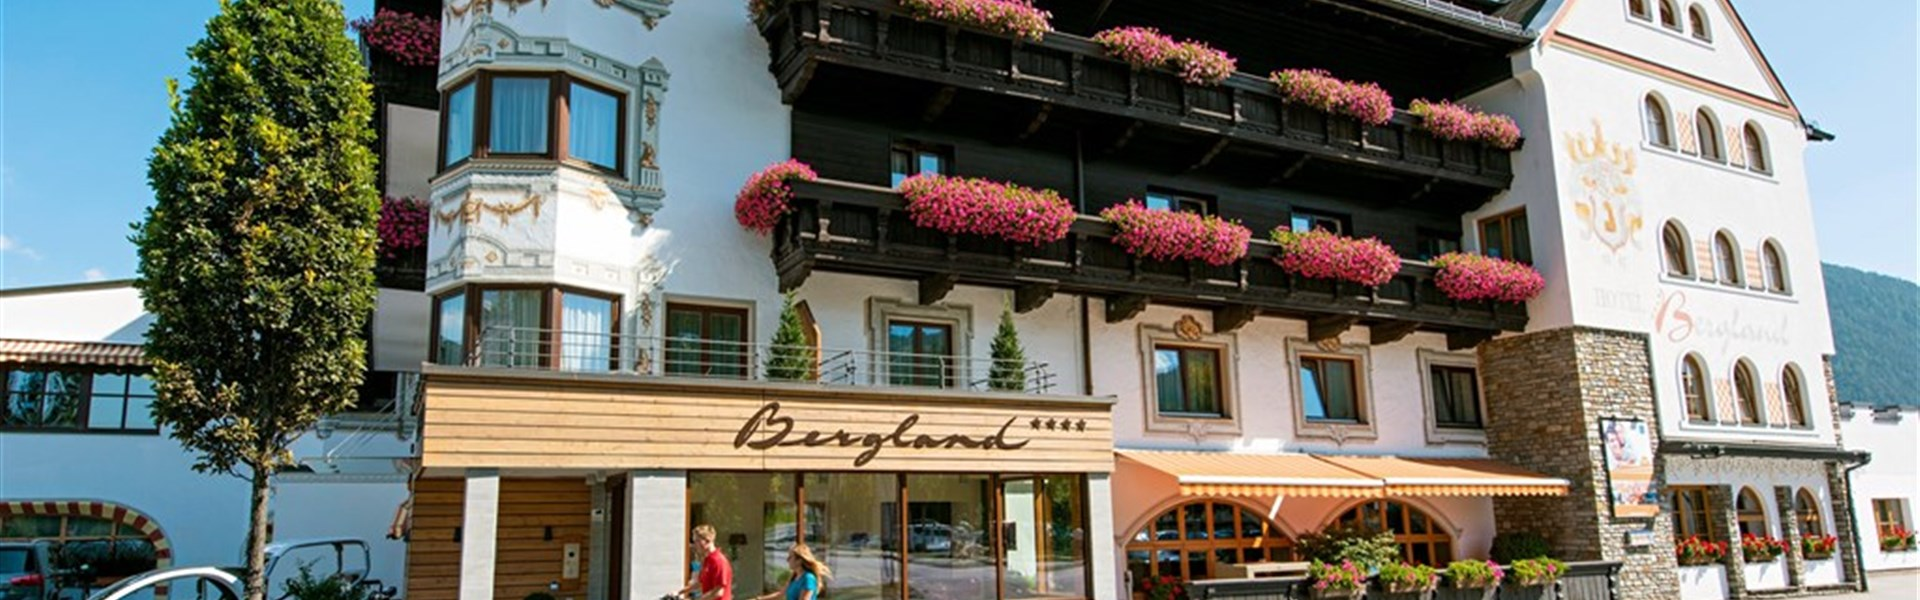 Marco Polo - Hotel Bergland -